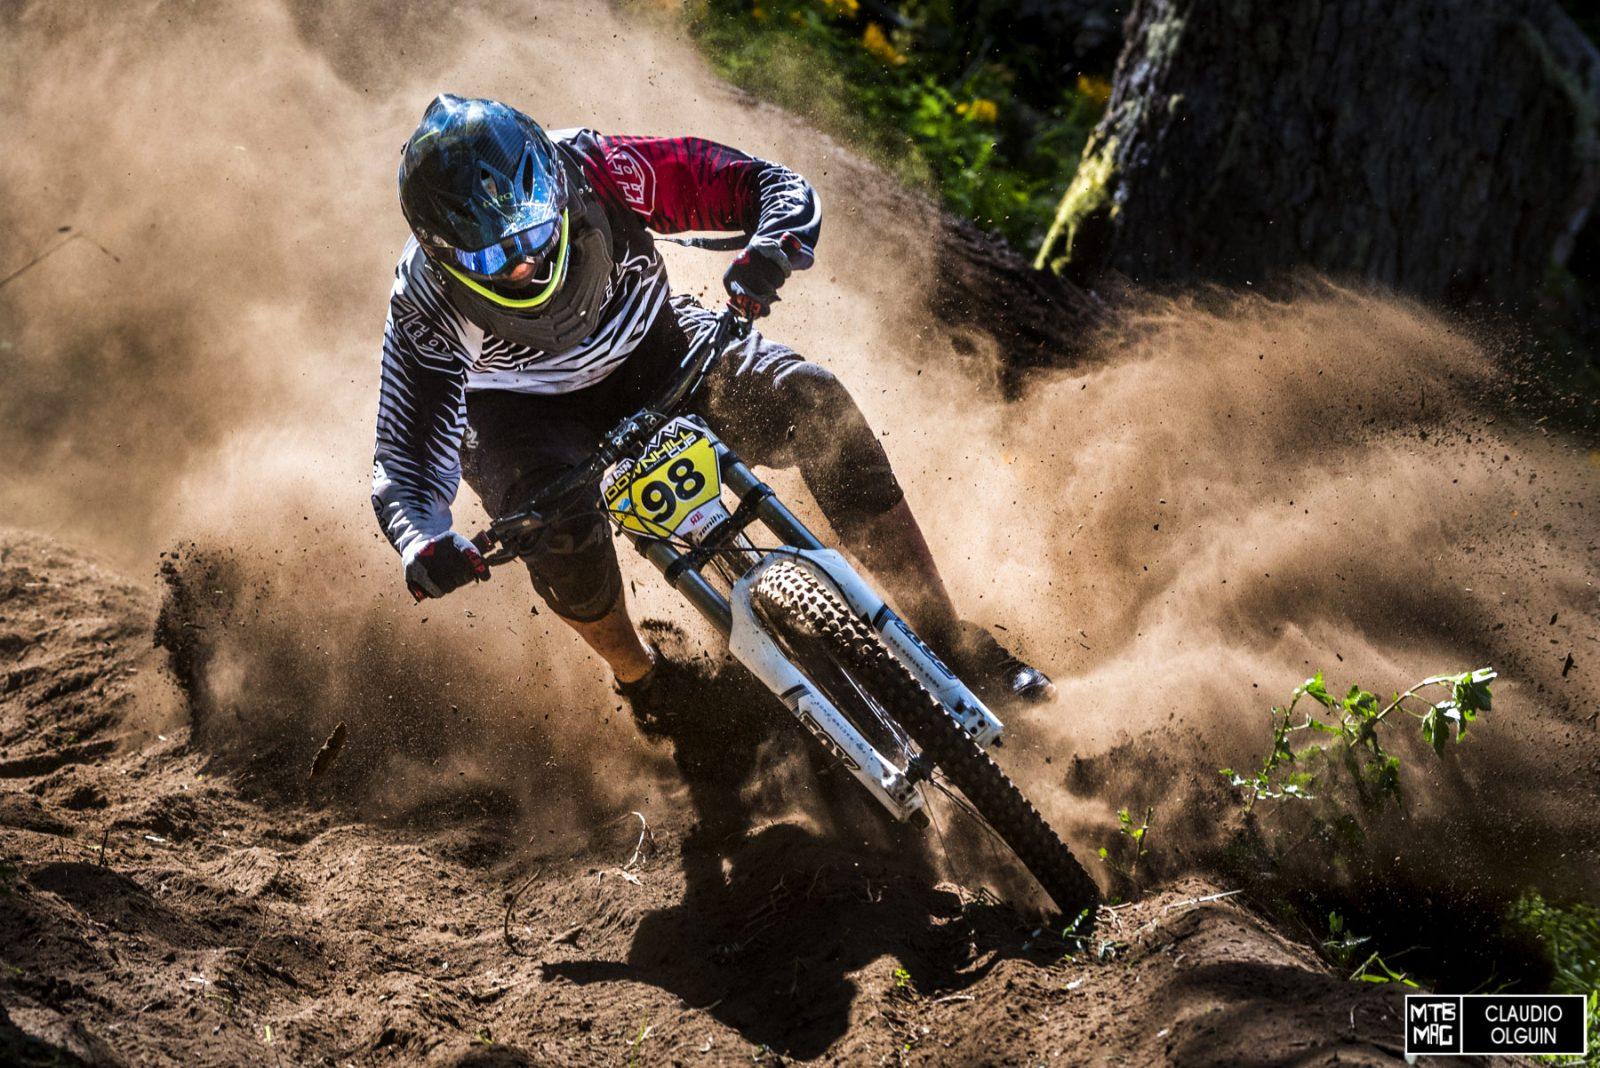 [Racing] IXS Downhill Cup Latin America